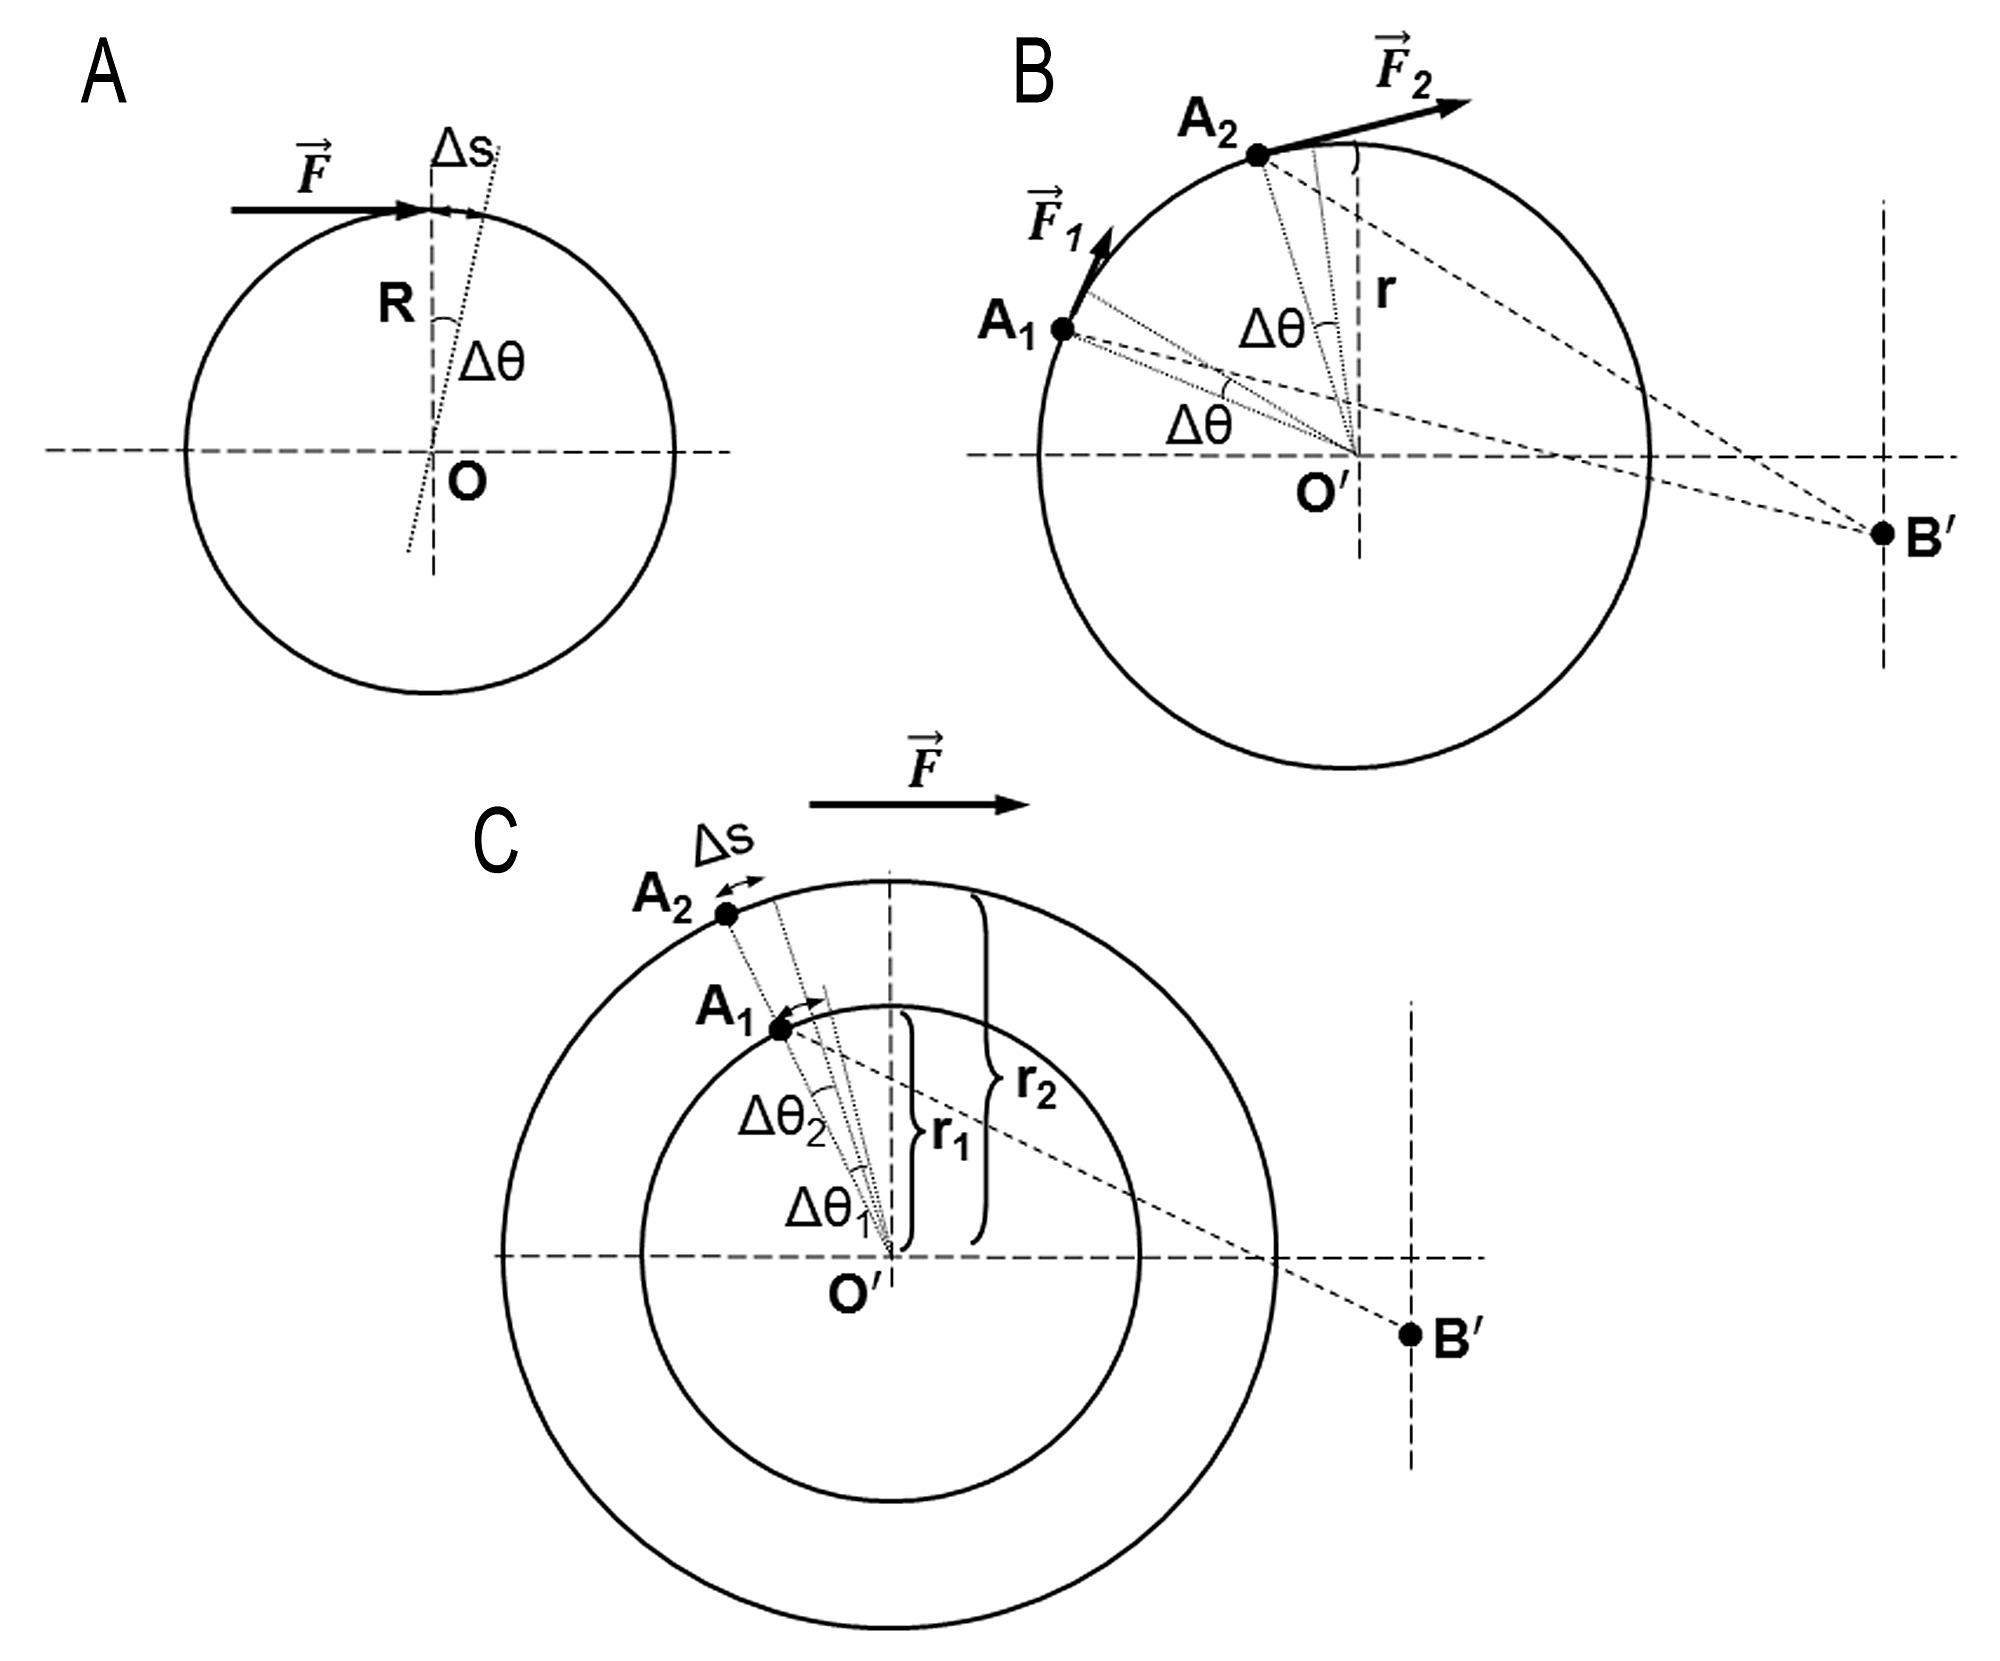 Biomechanics Of Forearm Rotation Force And Efficiency Of Pronator Teres